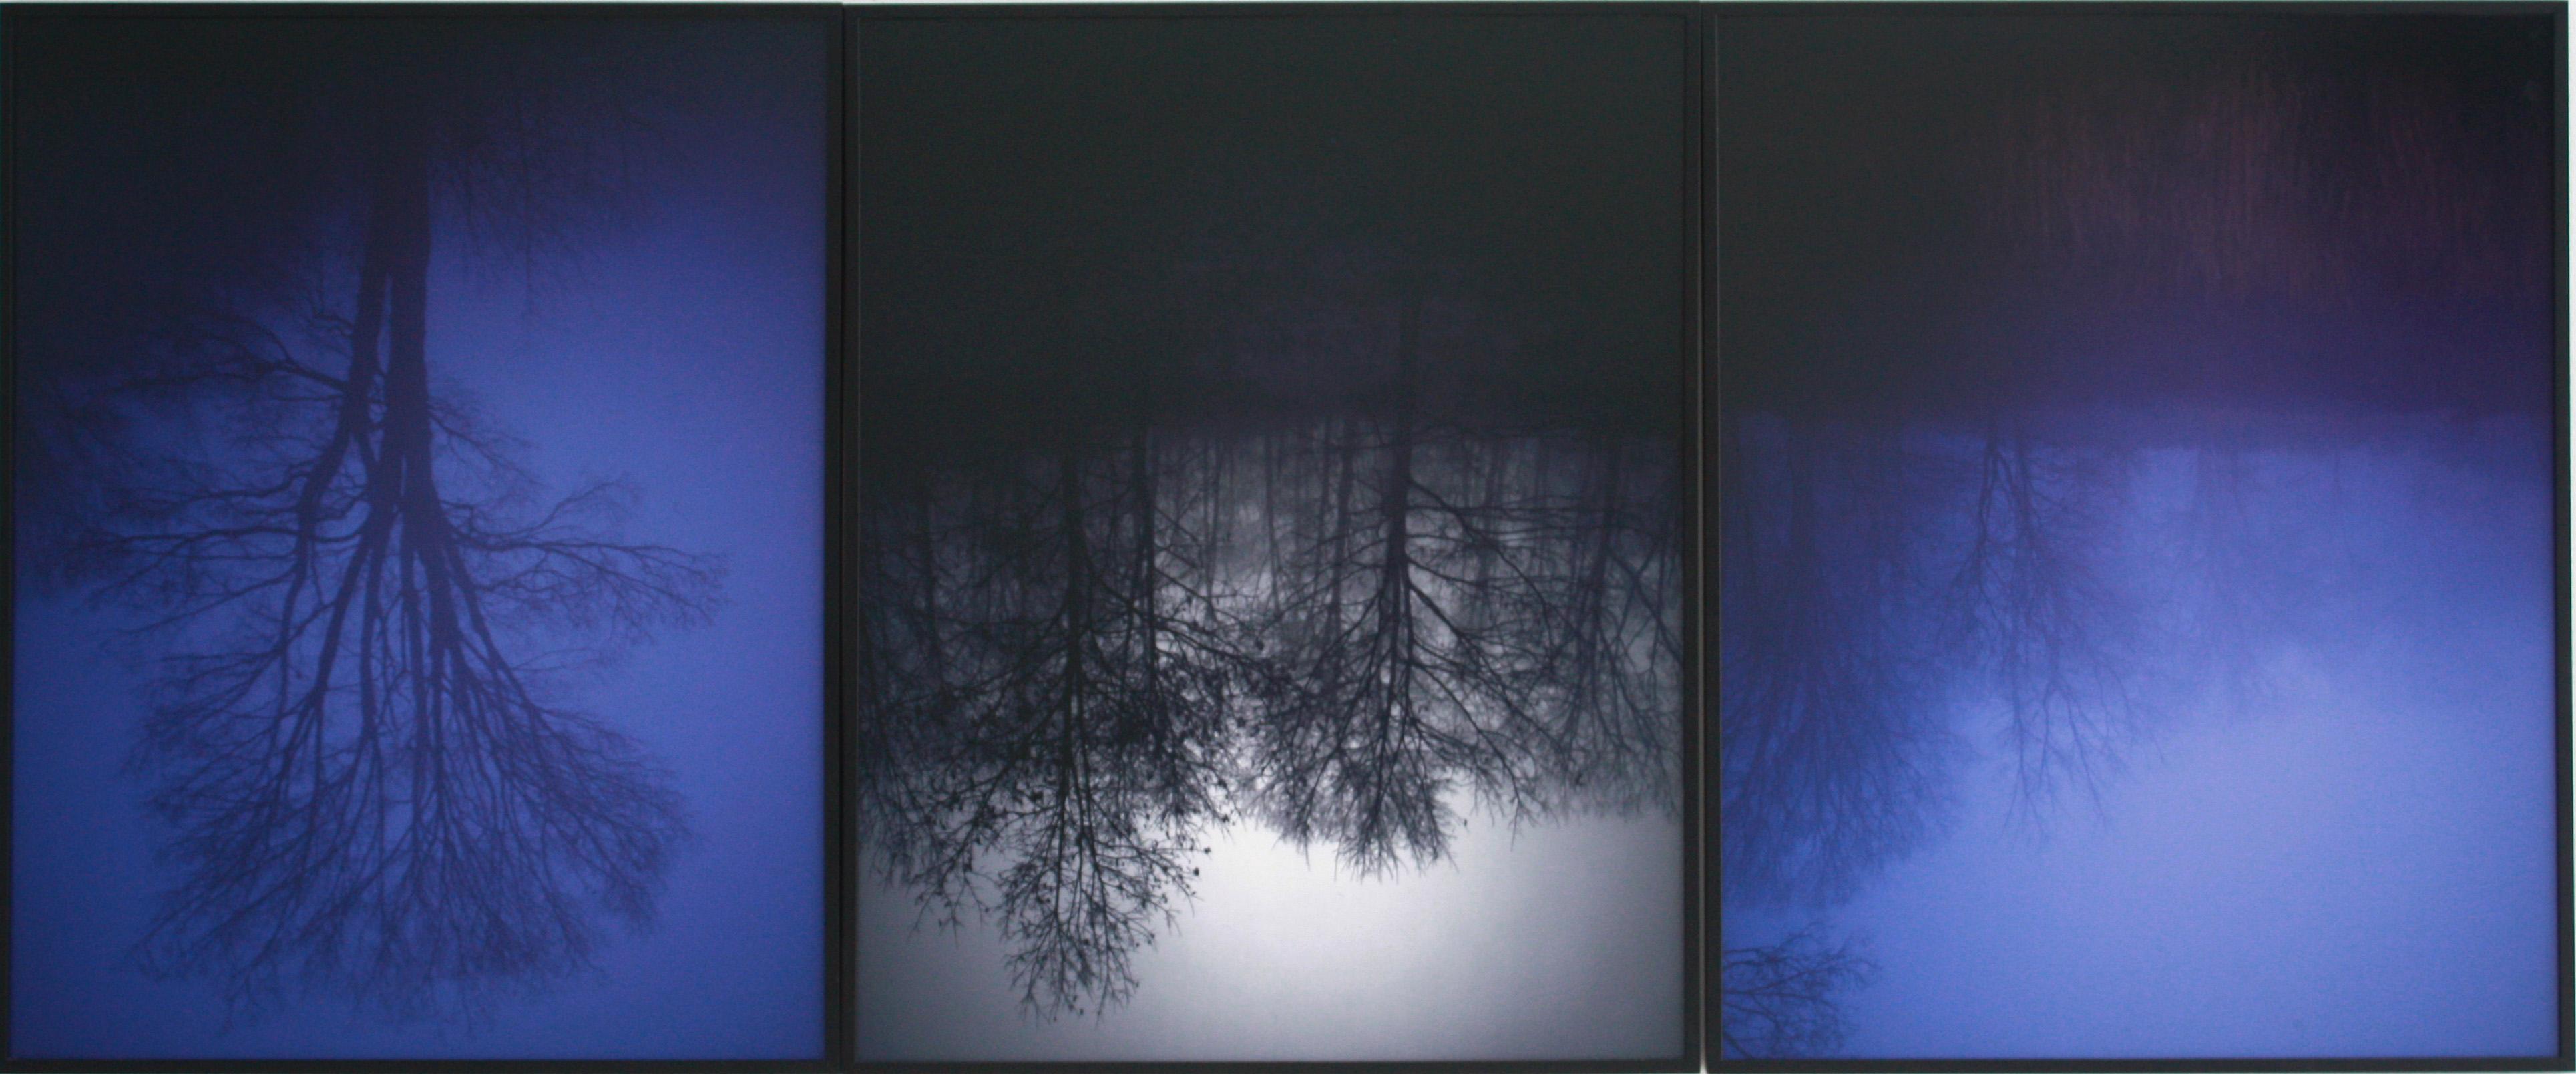 Blue Fog Triptychon, (ed.3), 2012, c-print, 75 x 60 cm. each